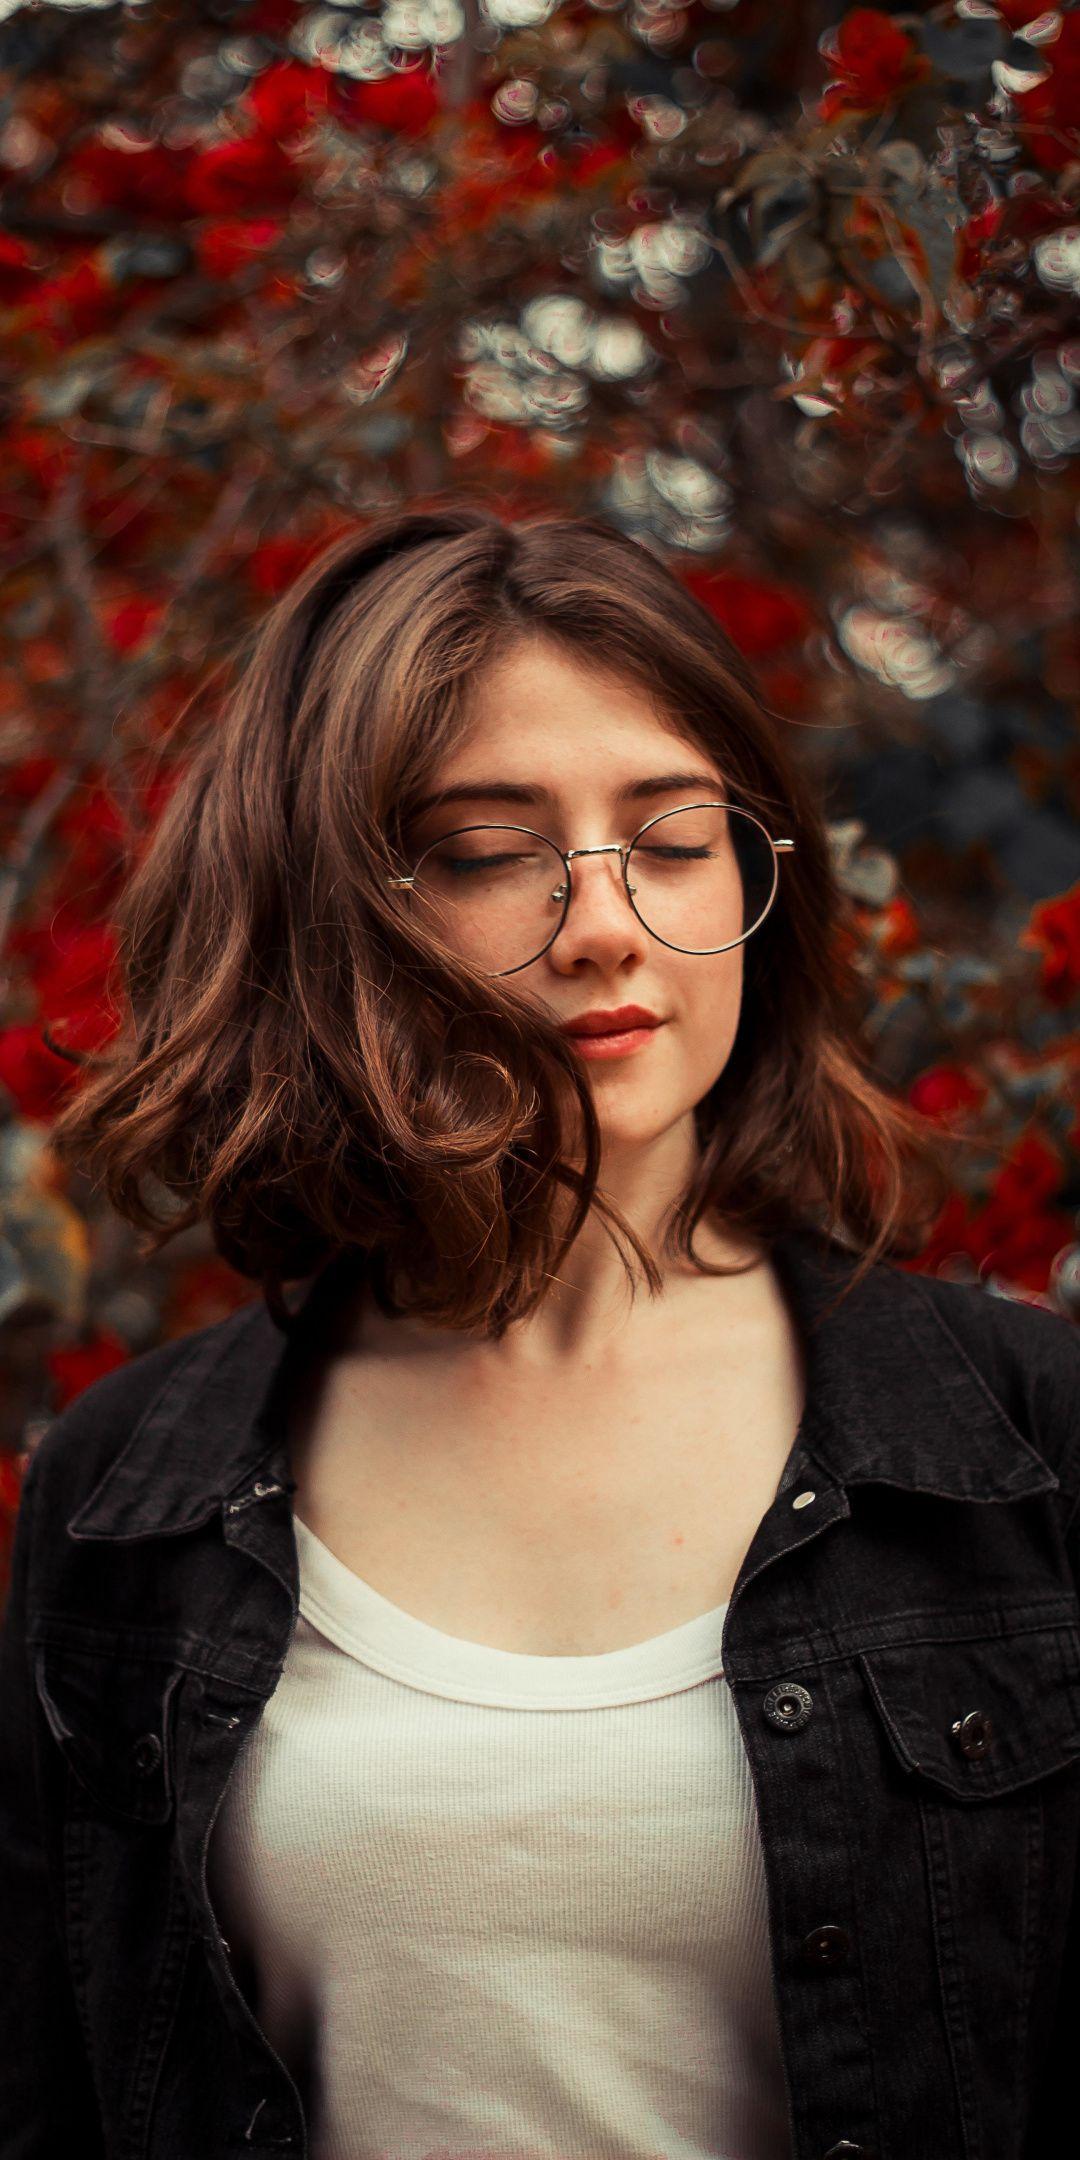 Close Eyes Cute Girl Model 1080x2160 Wallpaper Portrait Photography Poses Girl Photography Poses Photography Inspiration Portrait